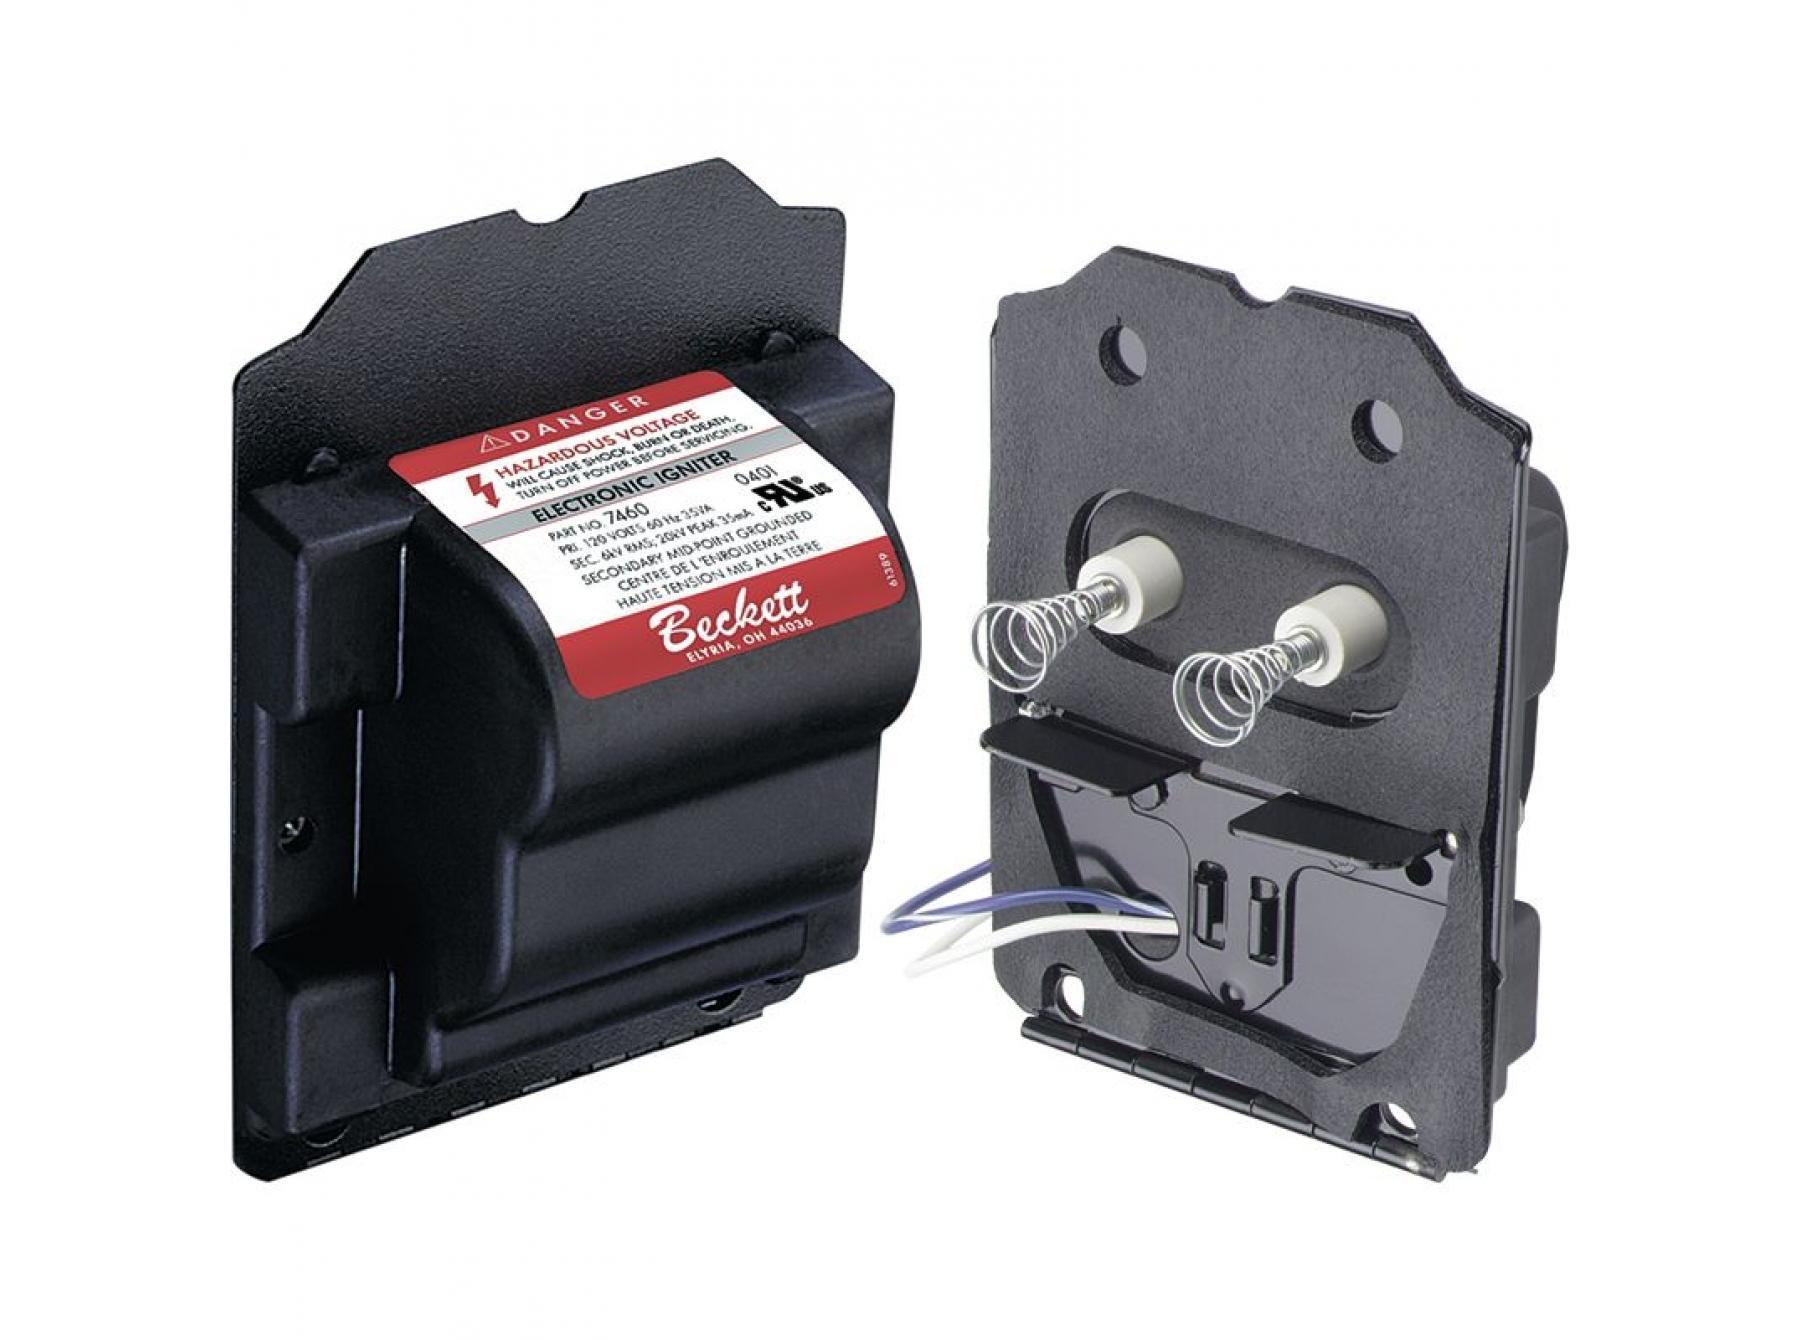 beckett oil 2002 volkswagen jetta fuse box diagram wayne burner msr dc wiring 38